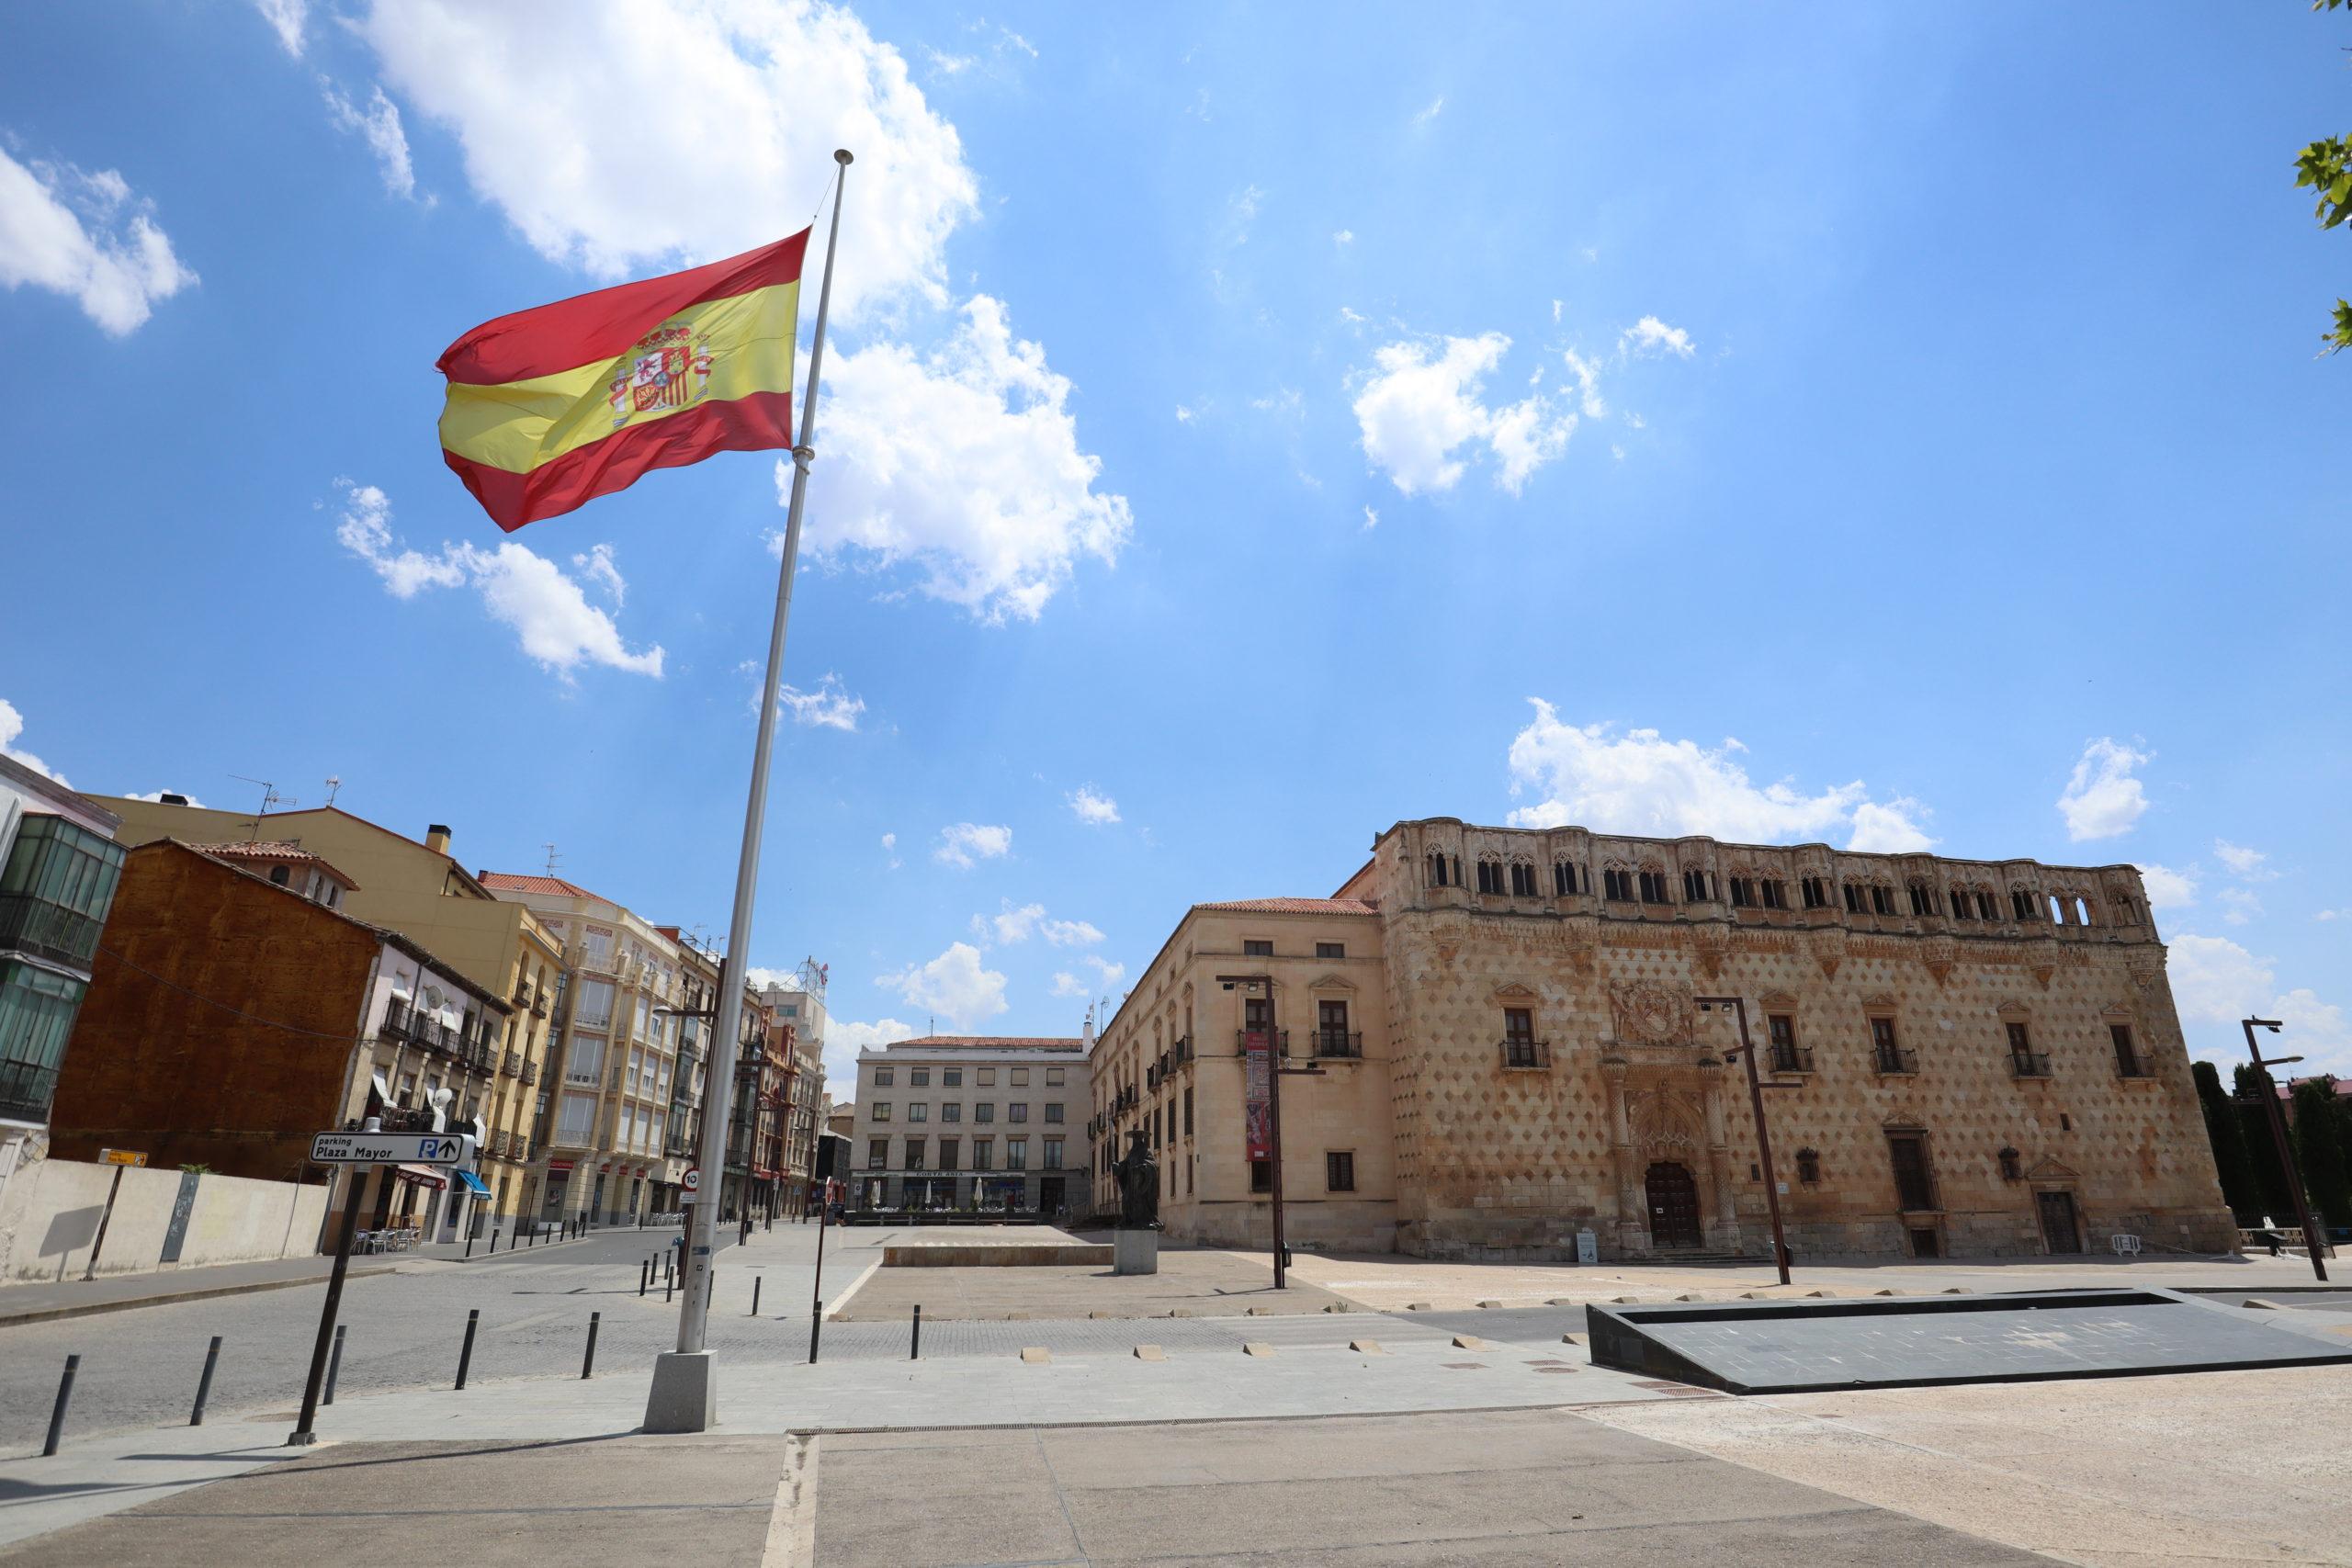 plaza-de-españa-de-guadalajara